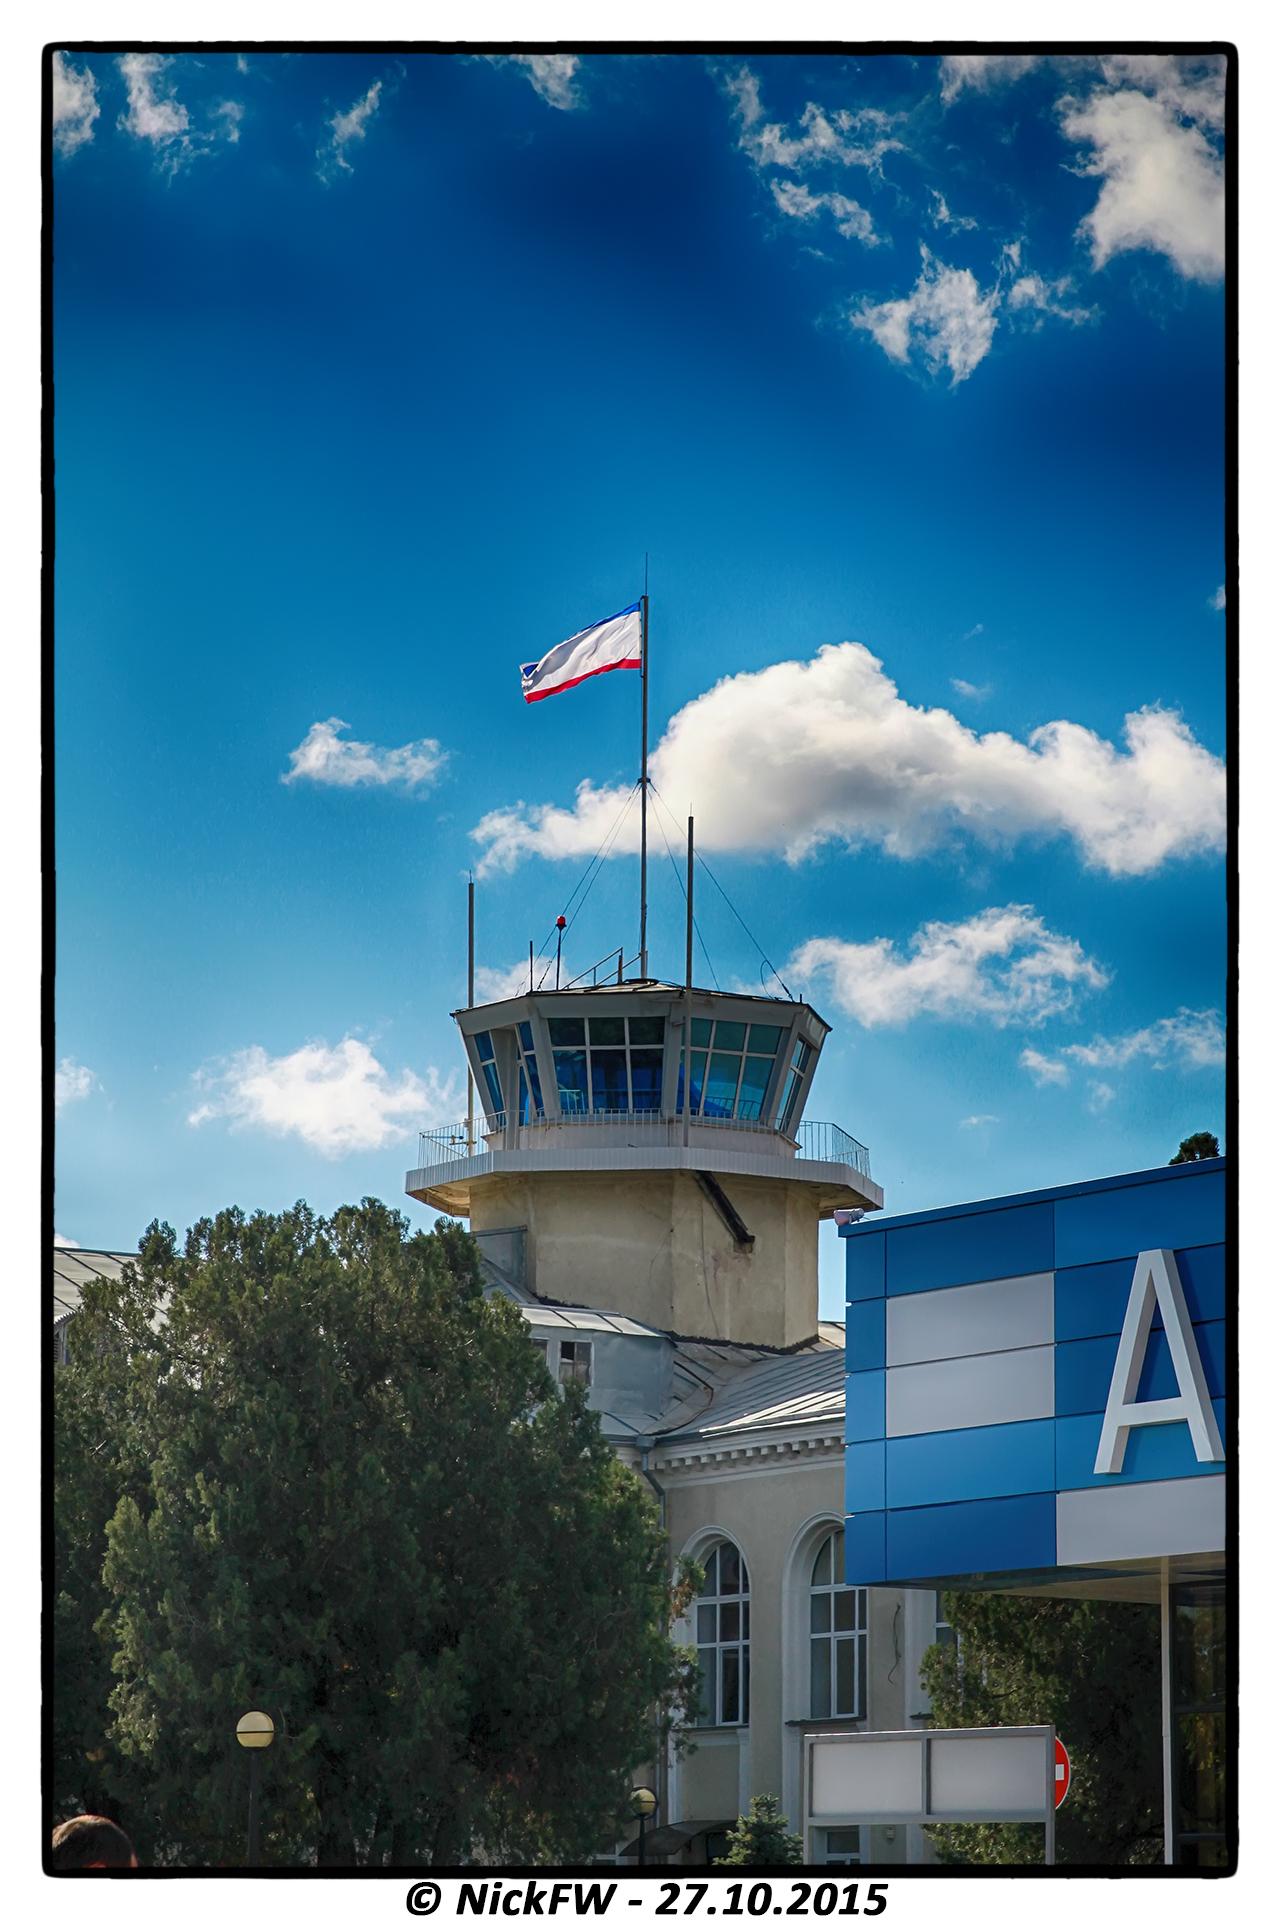 5. Аэропорт Симферополя © NickFW.ru - 27.10.2015г.